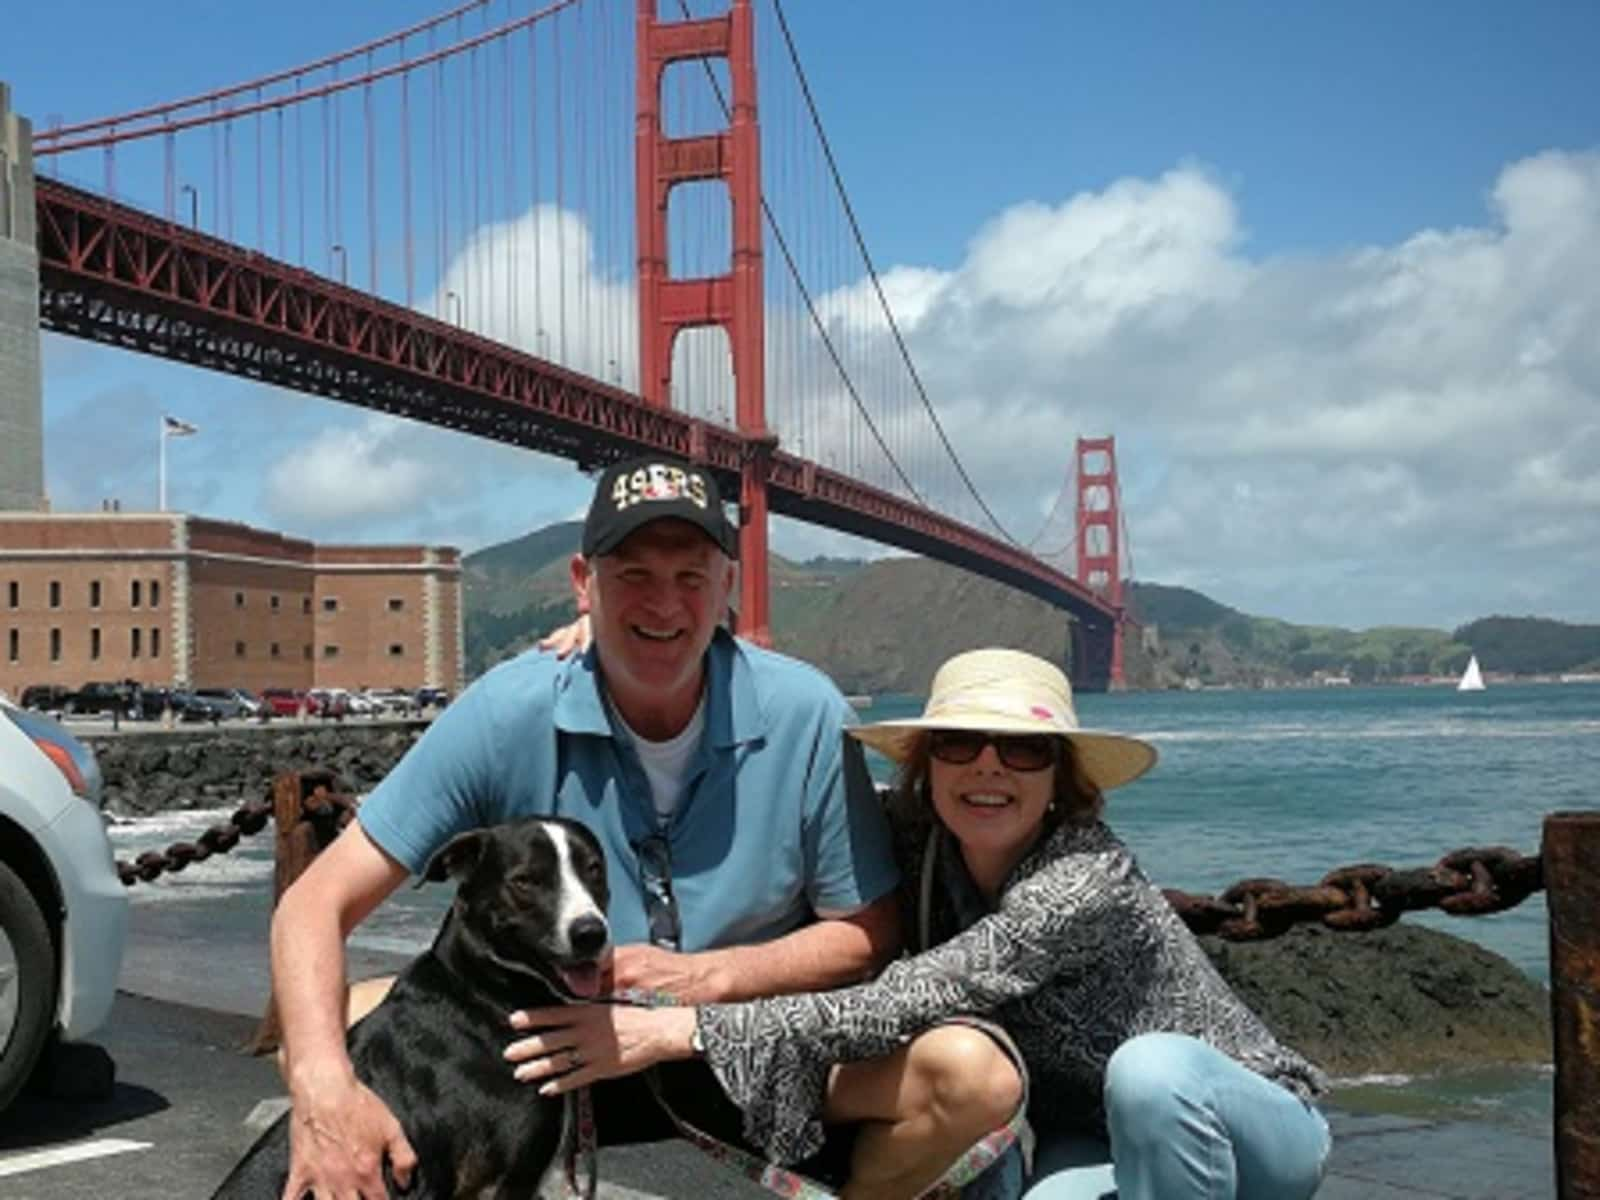 Peter & Carol from Halifax, Nova Scotia, Canada